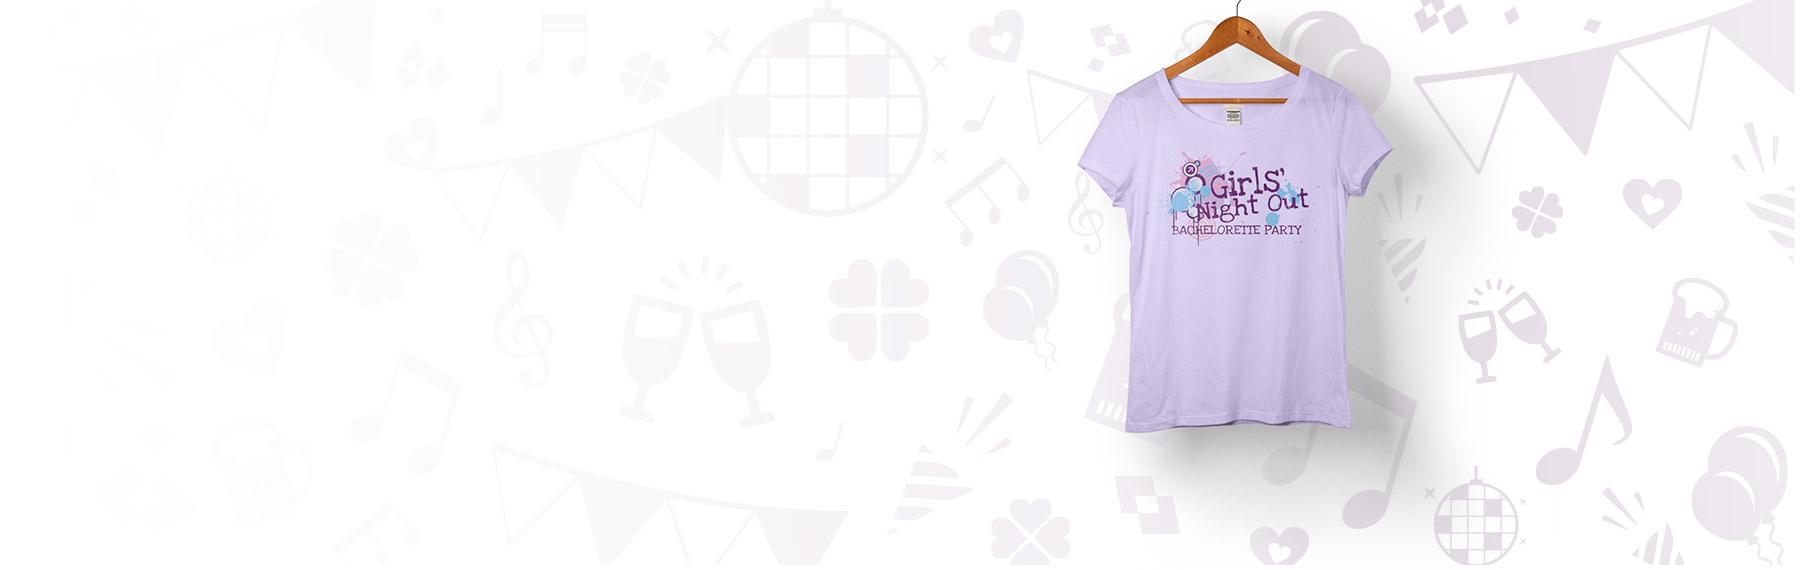 f0f89b9dc Design Custom Ladies T-Shirts Online in Canada | T-Shirt Elephant